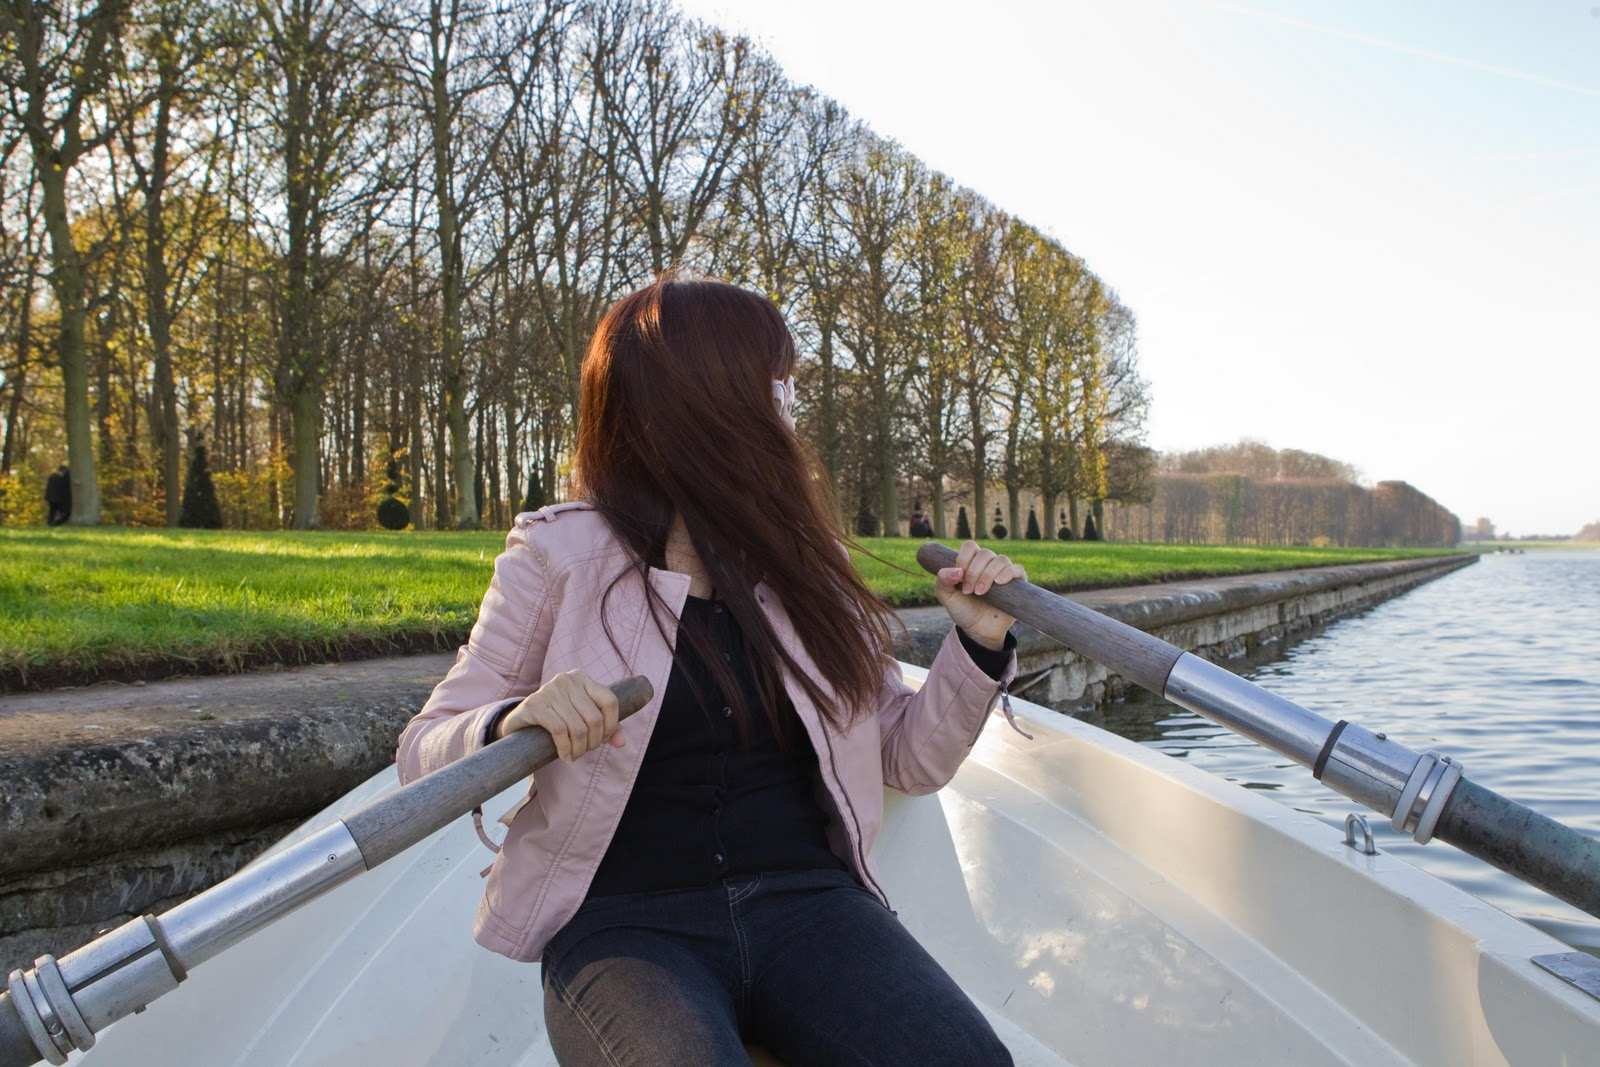 http://2.bp.blogspot.com/-YltHNVt-OuI/TygG13ZDmHI/AAAAAAAAiaA/oEzKW98oH7s/s1600/Versailles+rowing+boat-7.jpg